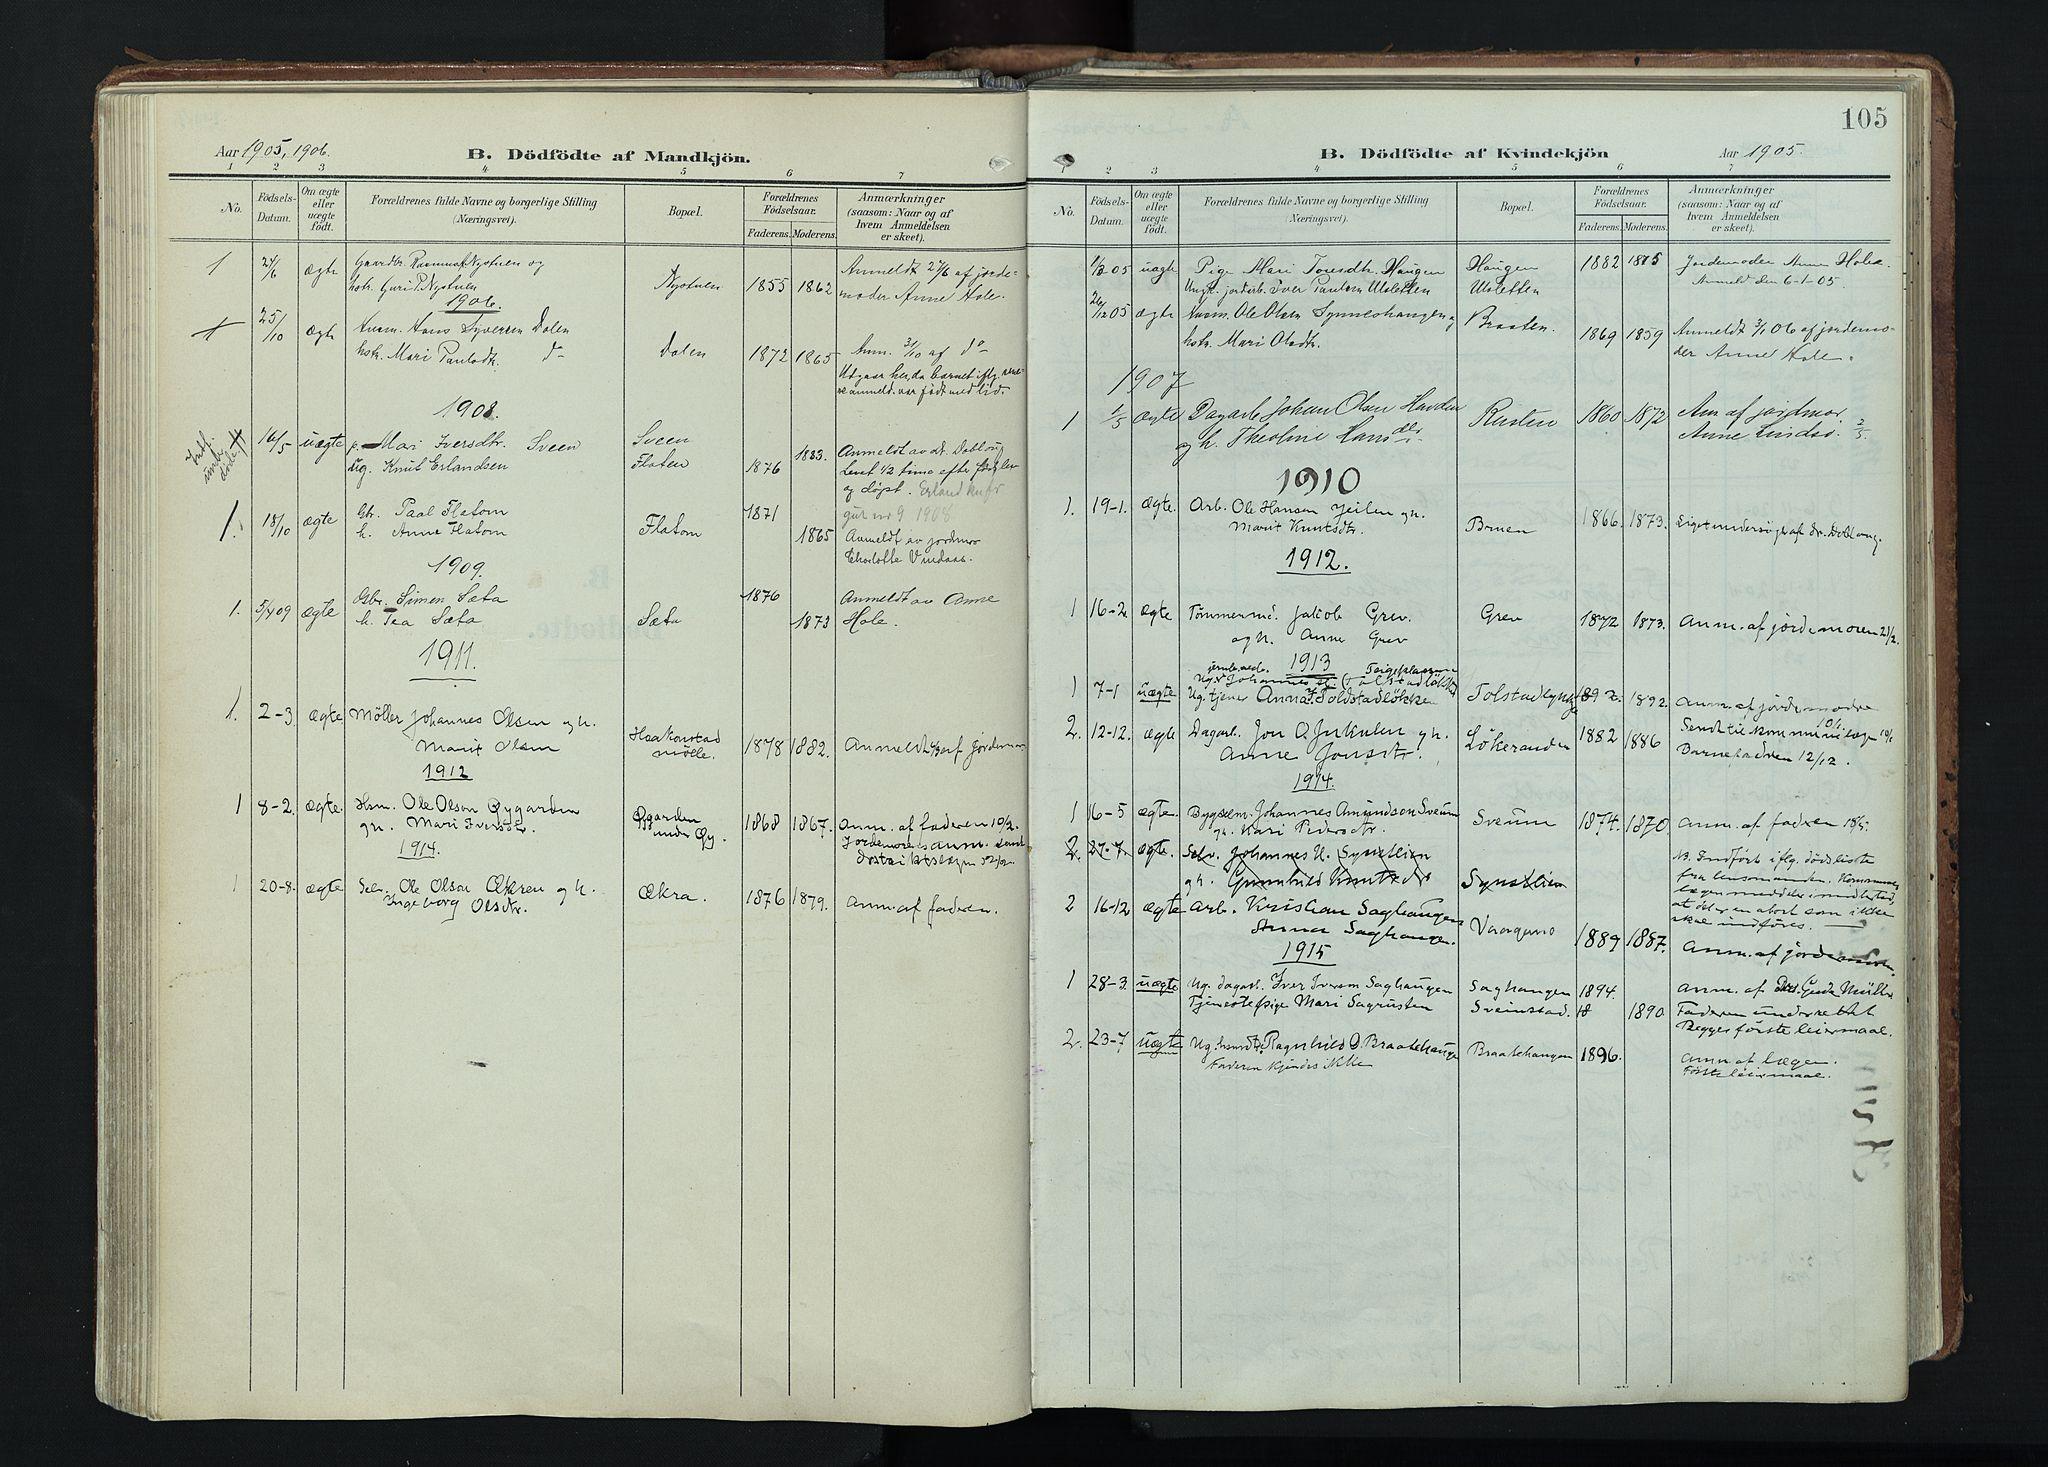 SAH, Vågå prestekontor, Ministerialbok nr. 11, 1905-1924, s. 105